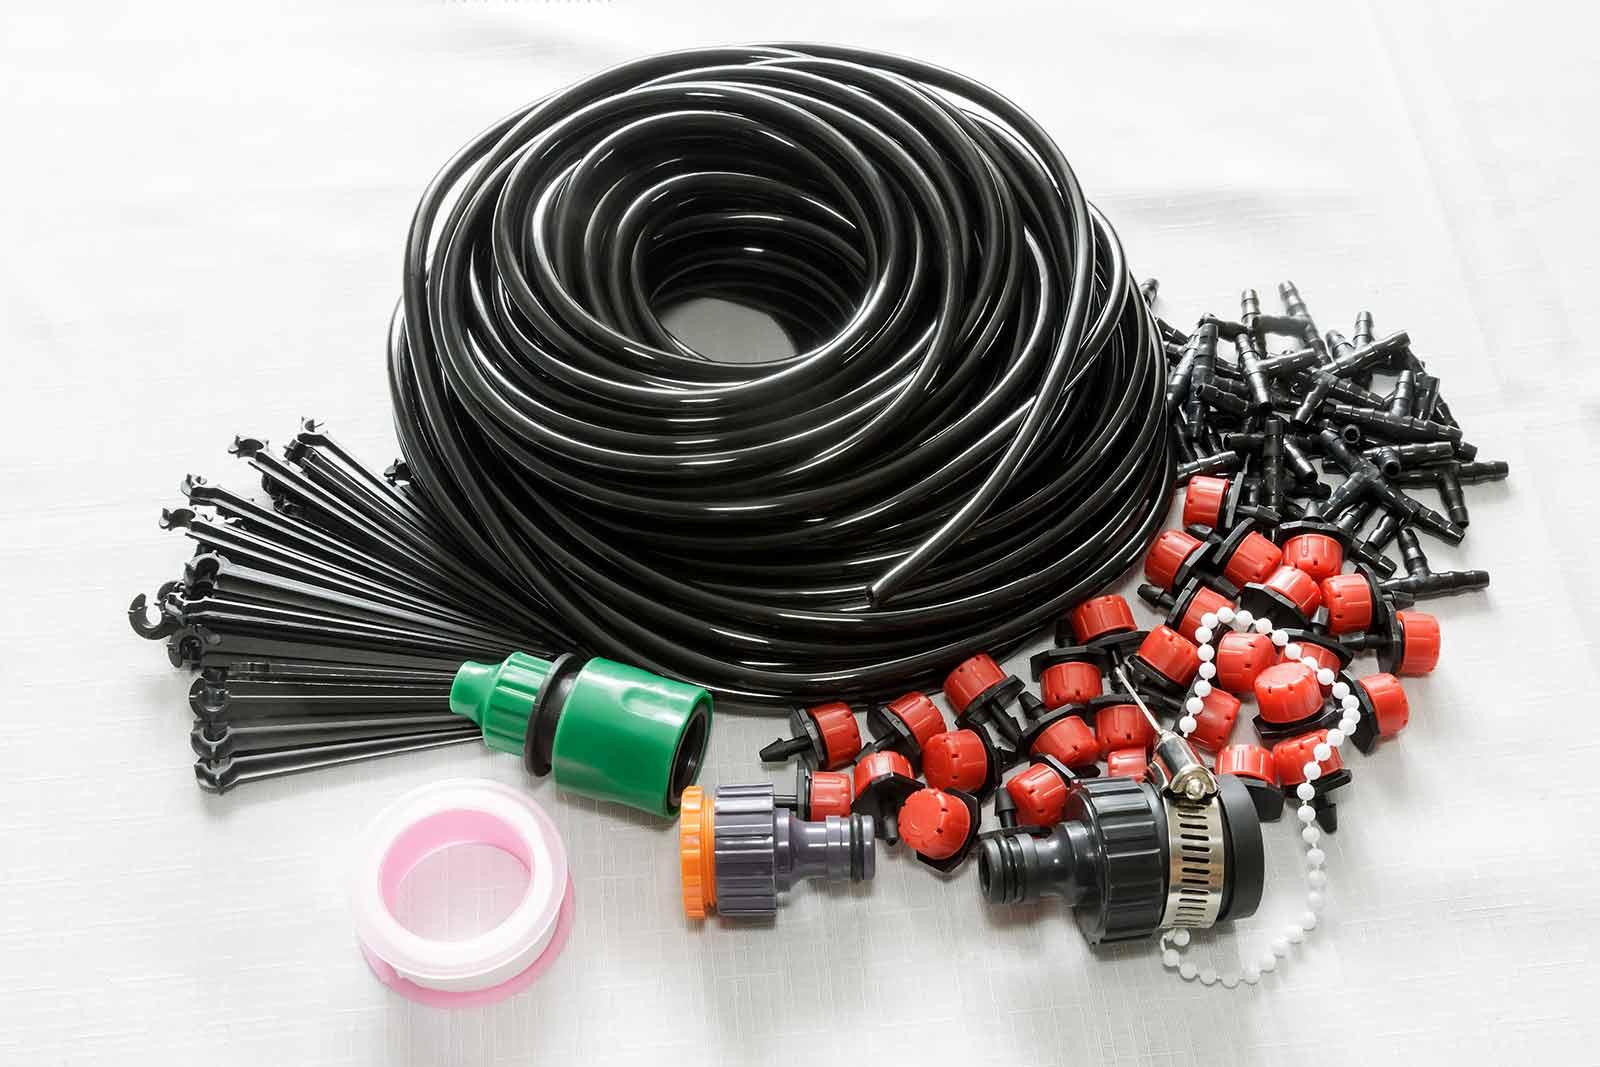 10x LED cablati 12 Volt 3mm ARANCIO cablate LED Con Cavo saldata 12v